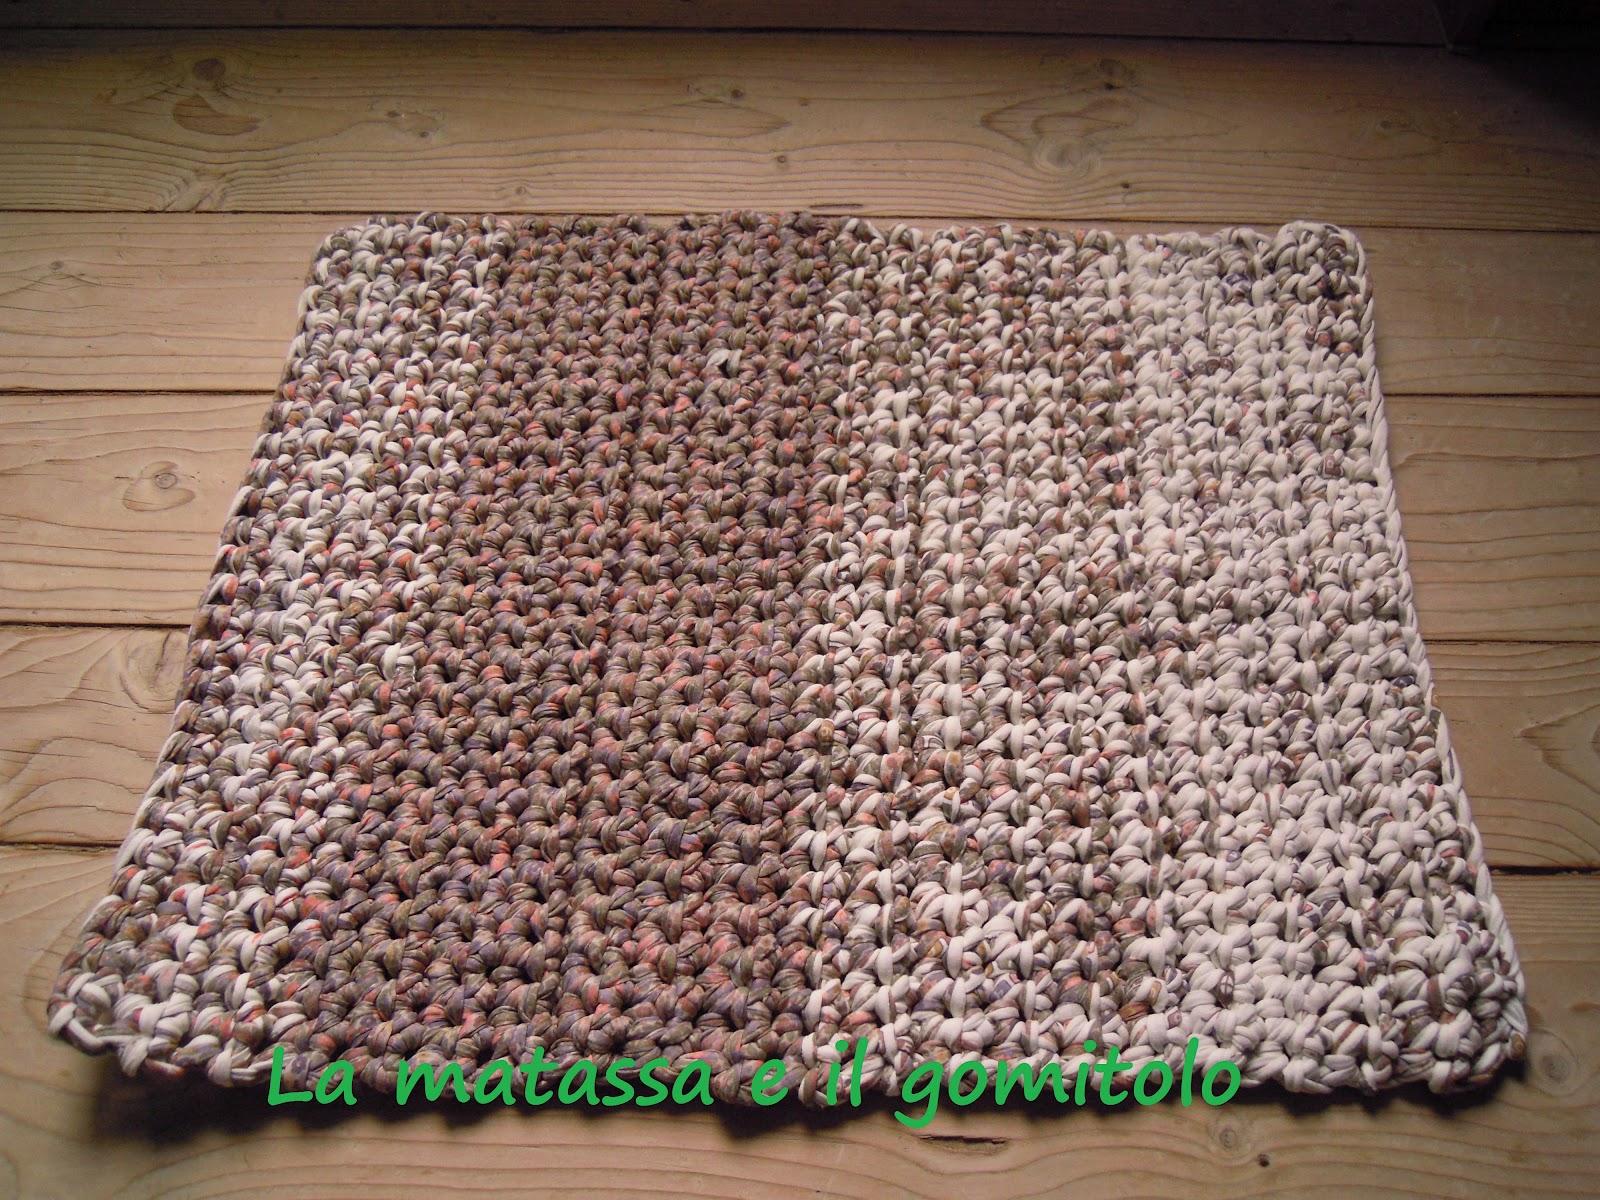 Tappeto Ovale Alluncinetto : Tappeto ovale in vendita ebay